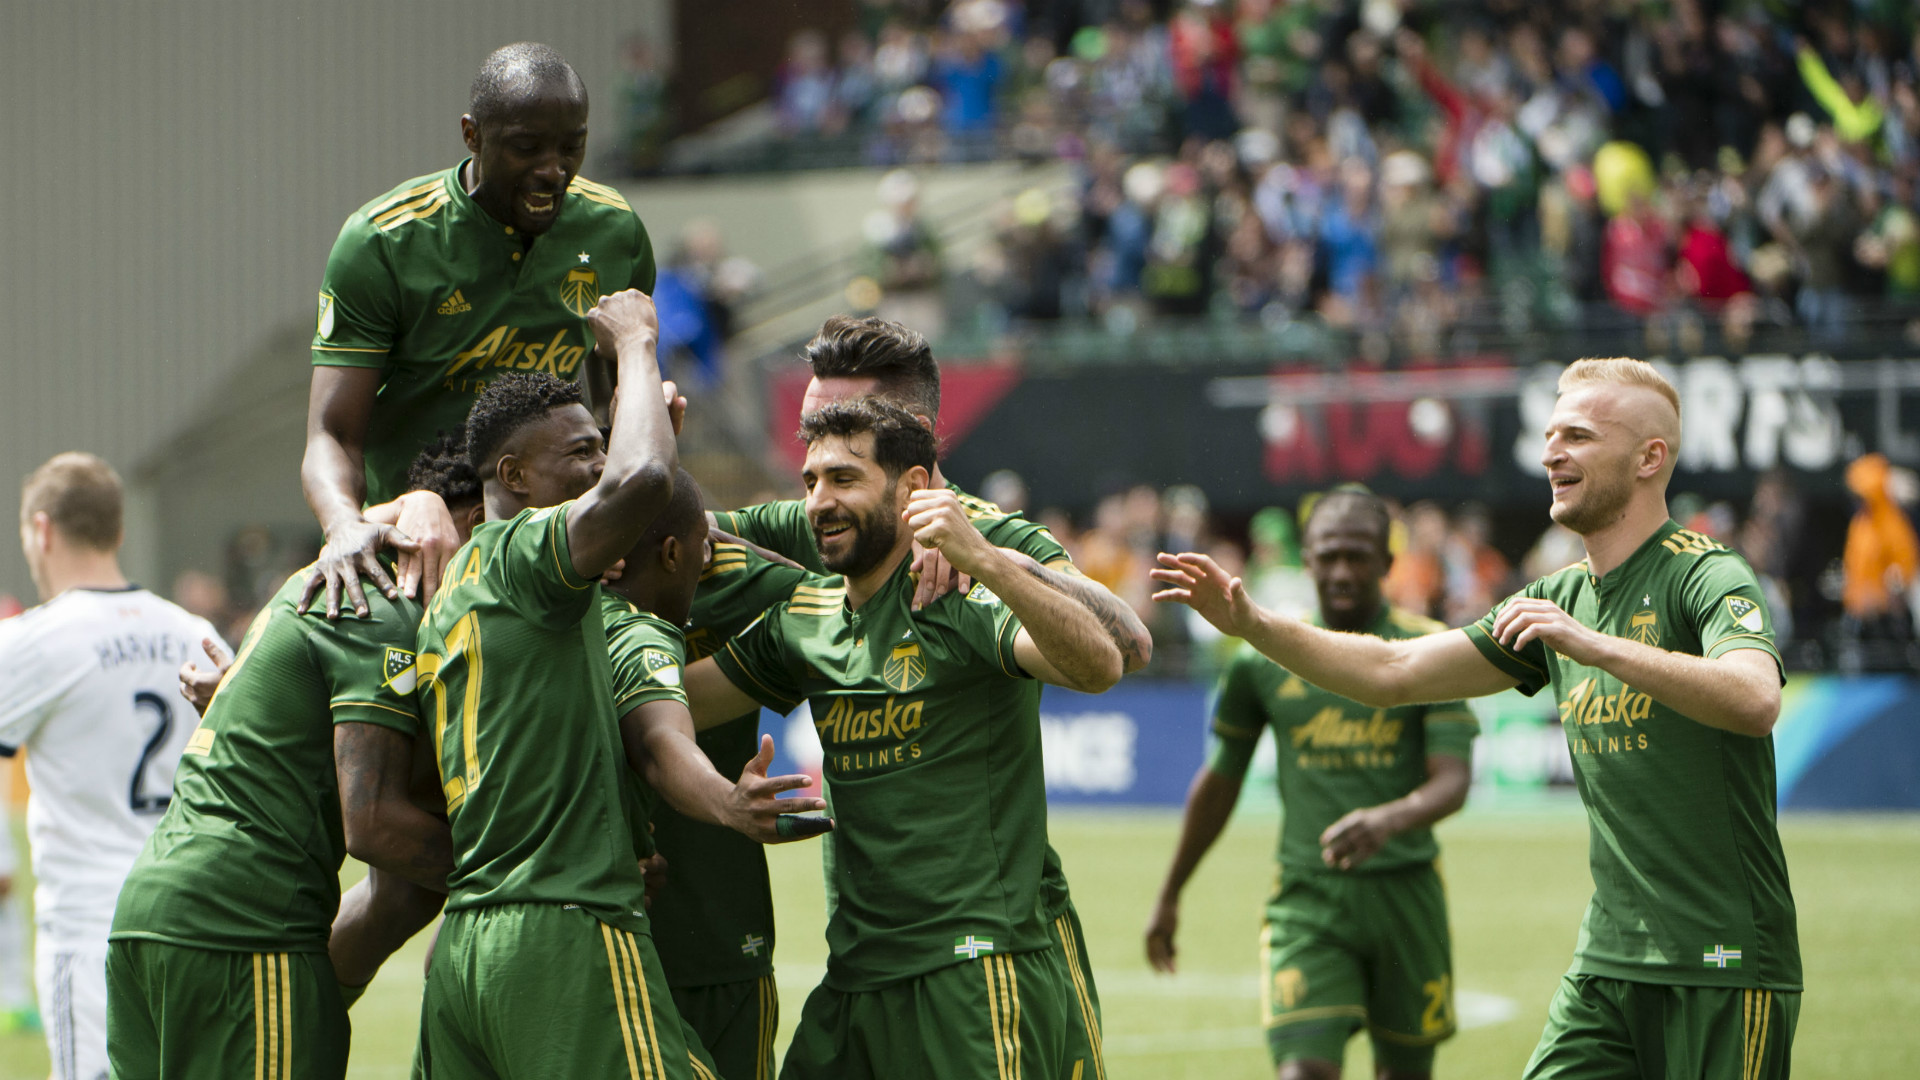 Portland Timbers goal celebration